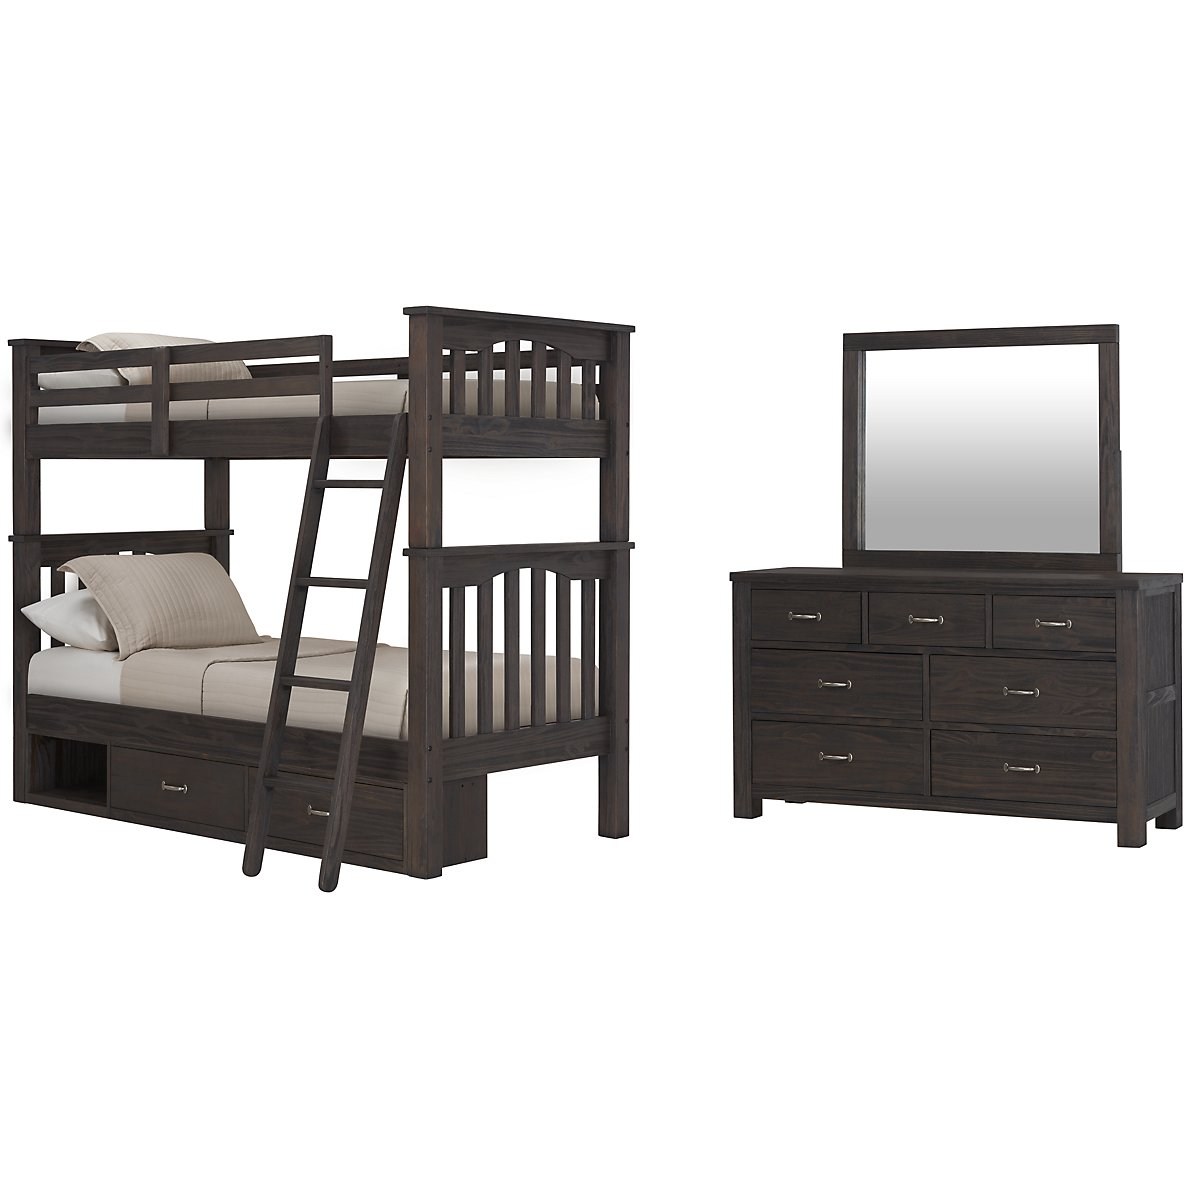 Highlands Dark Tone Wood Bunk Bed Storage Bedroom